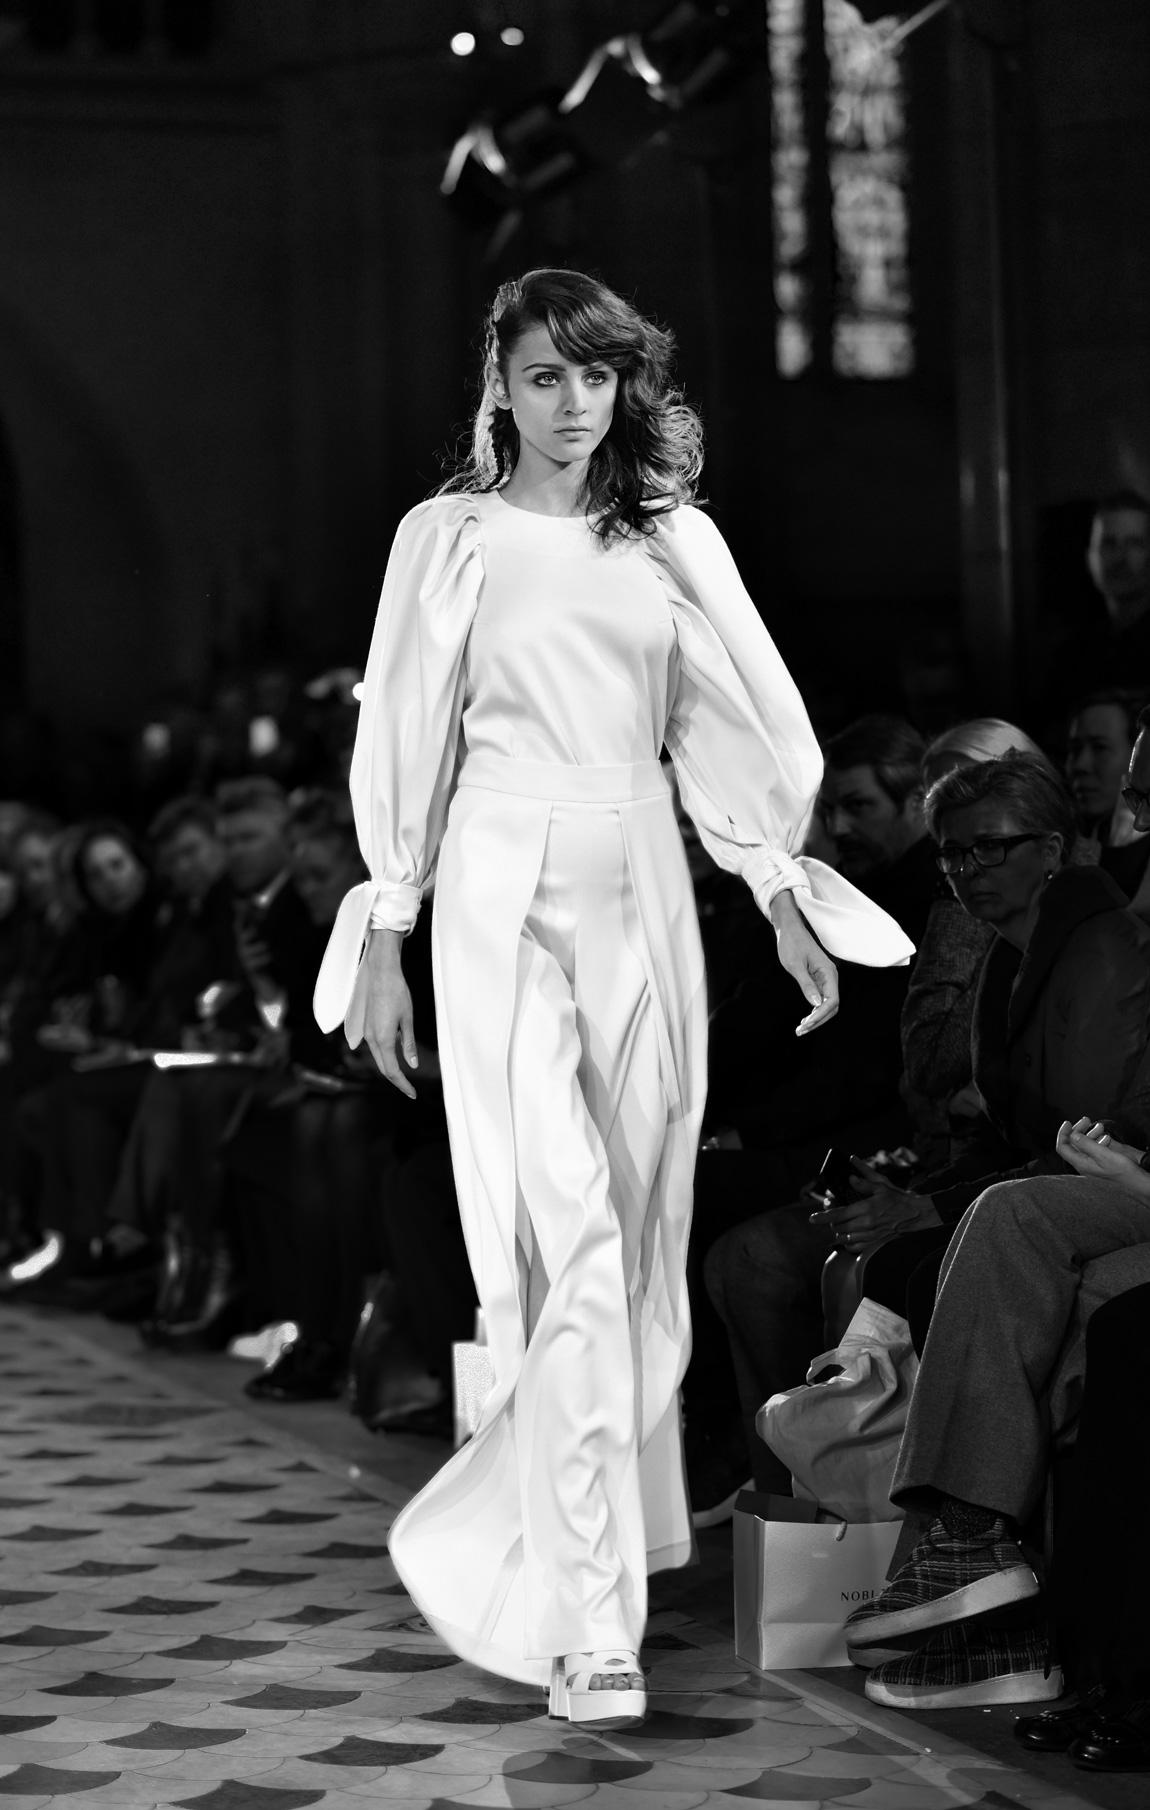 nobi talai, paris, fashionshow, modenschau, laufsteg, runway, kollektion, modedesign, fashion, designer